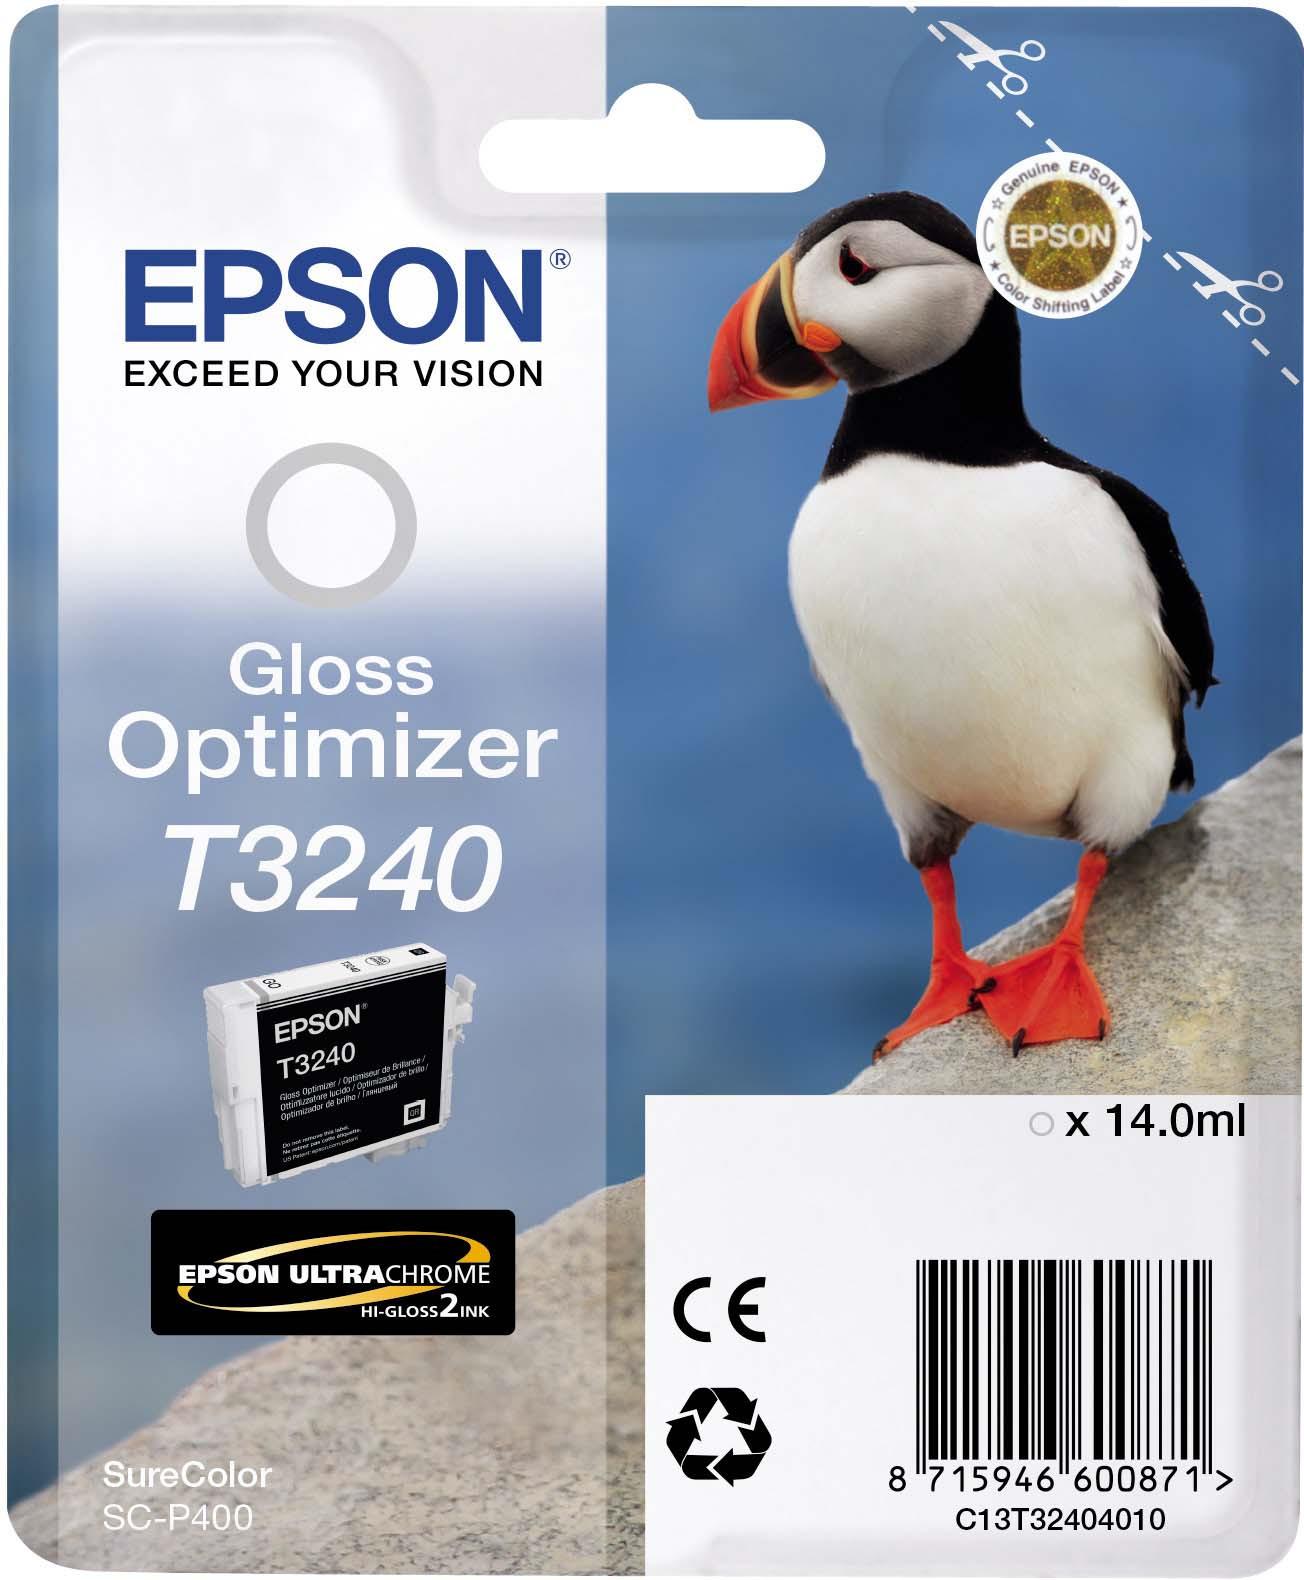 Оптимизатор глянца Epson C13T32404010 Gloss optimizer для принтеров Epson SC-P400